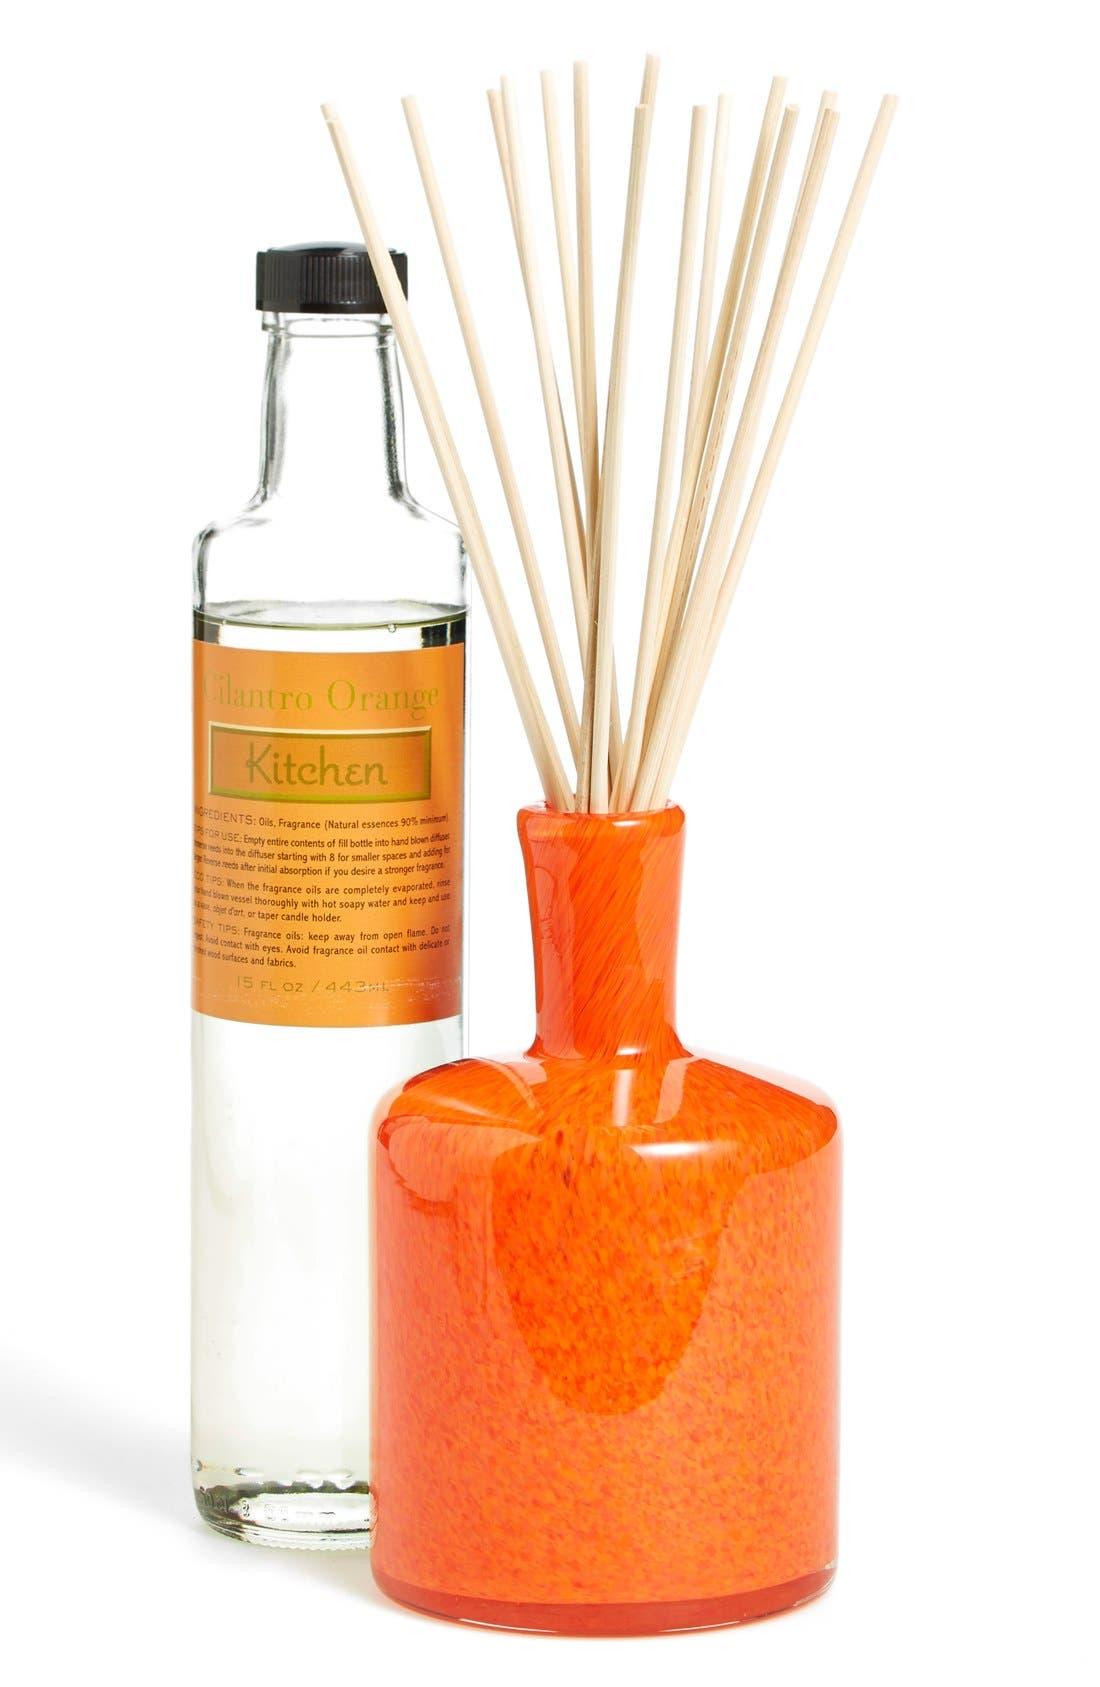 'Cilantro Orange - Kitchen' Fragrance Diffuser,                             Main thumbnail 1, color,                             NO COLOR